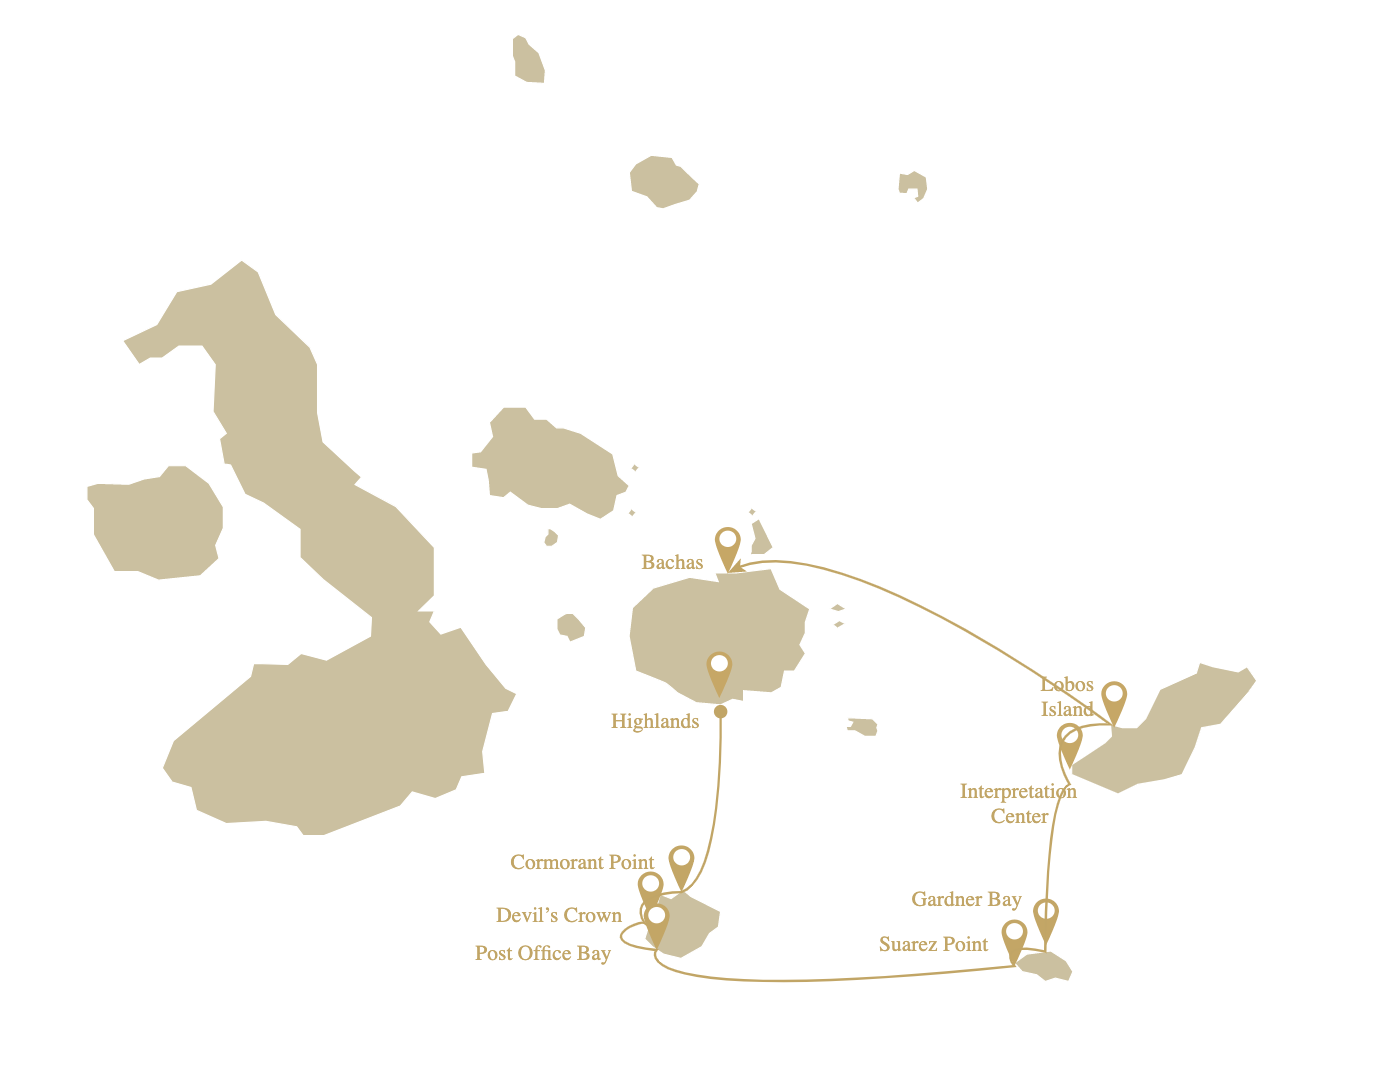 Bonita Galapagos Itineary south 5 days